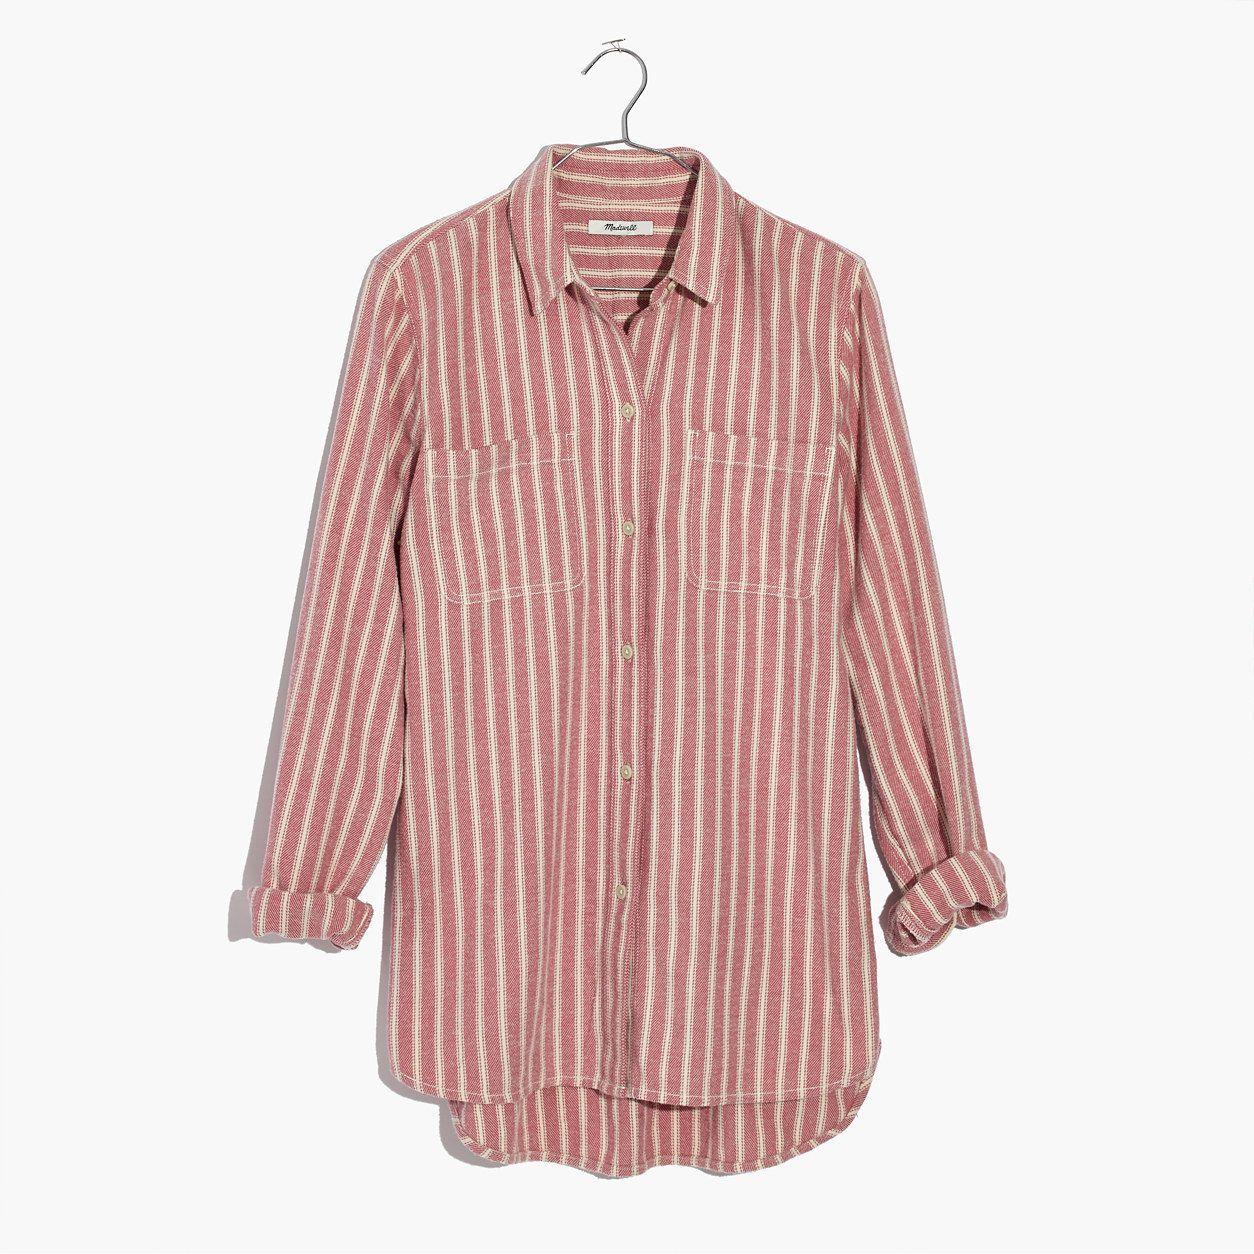 a7d291a11 Madewell Womens Flannel Classic Ex-Boyfriend Shirt In Craig Stripe ...